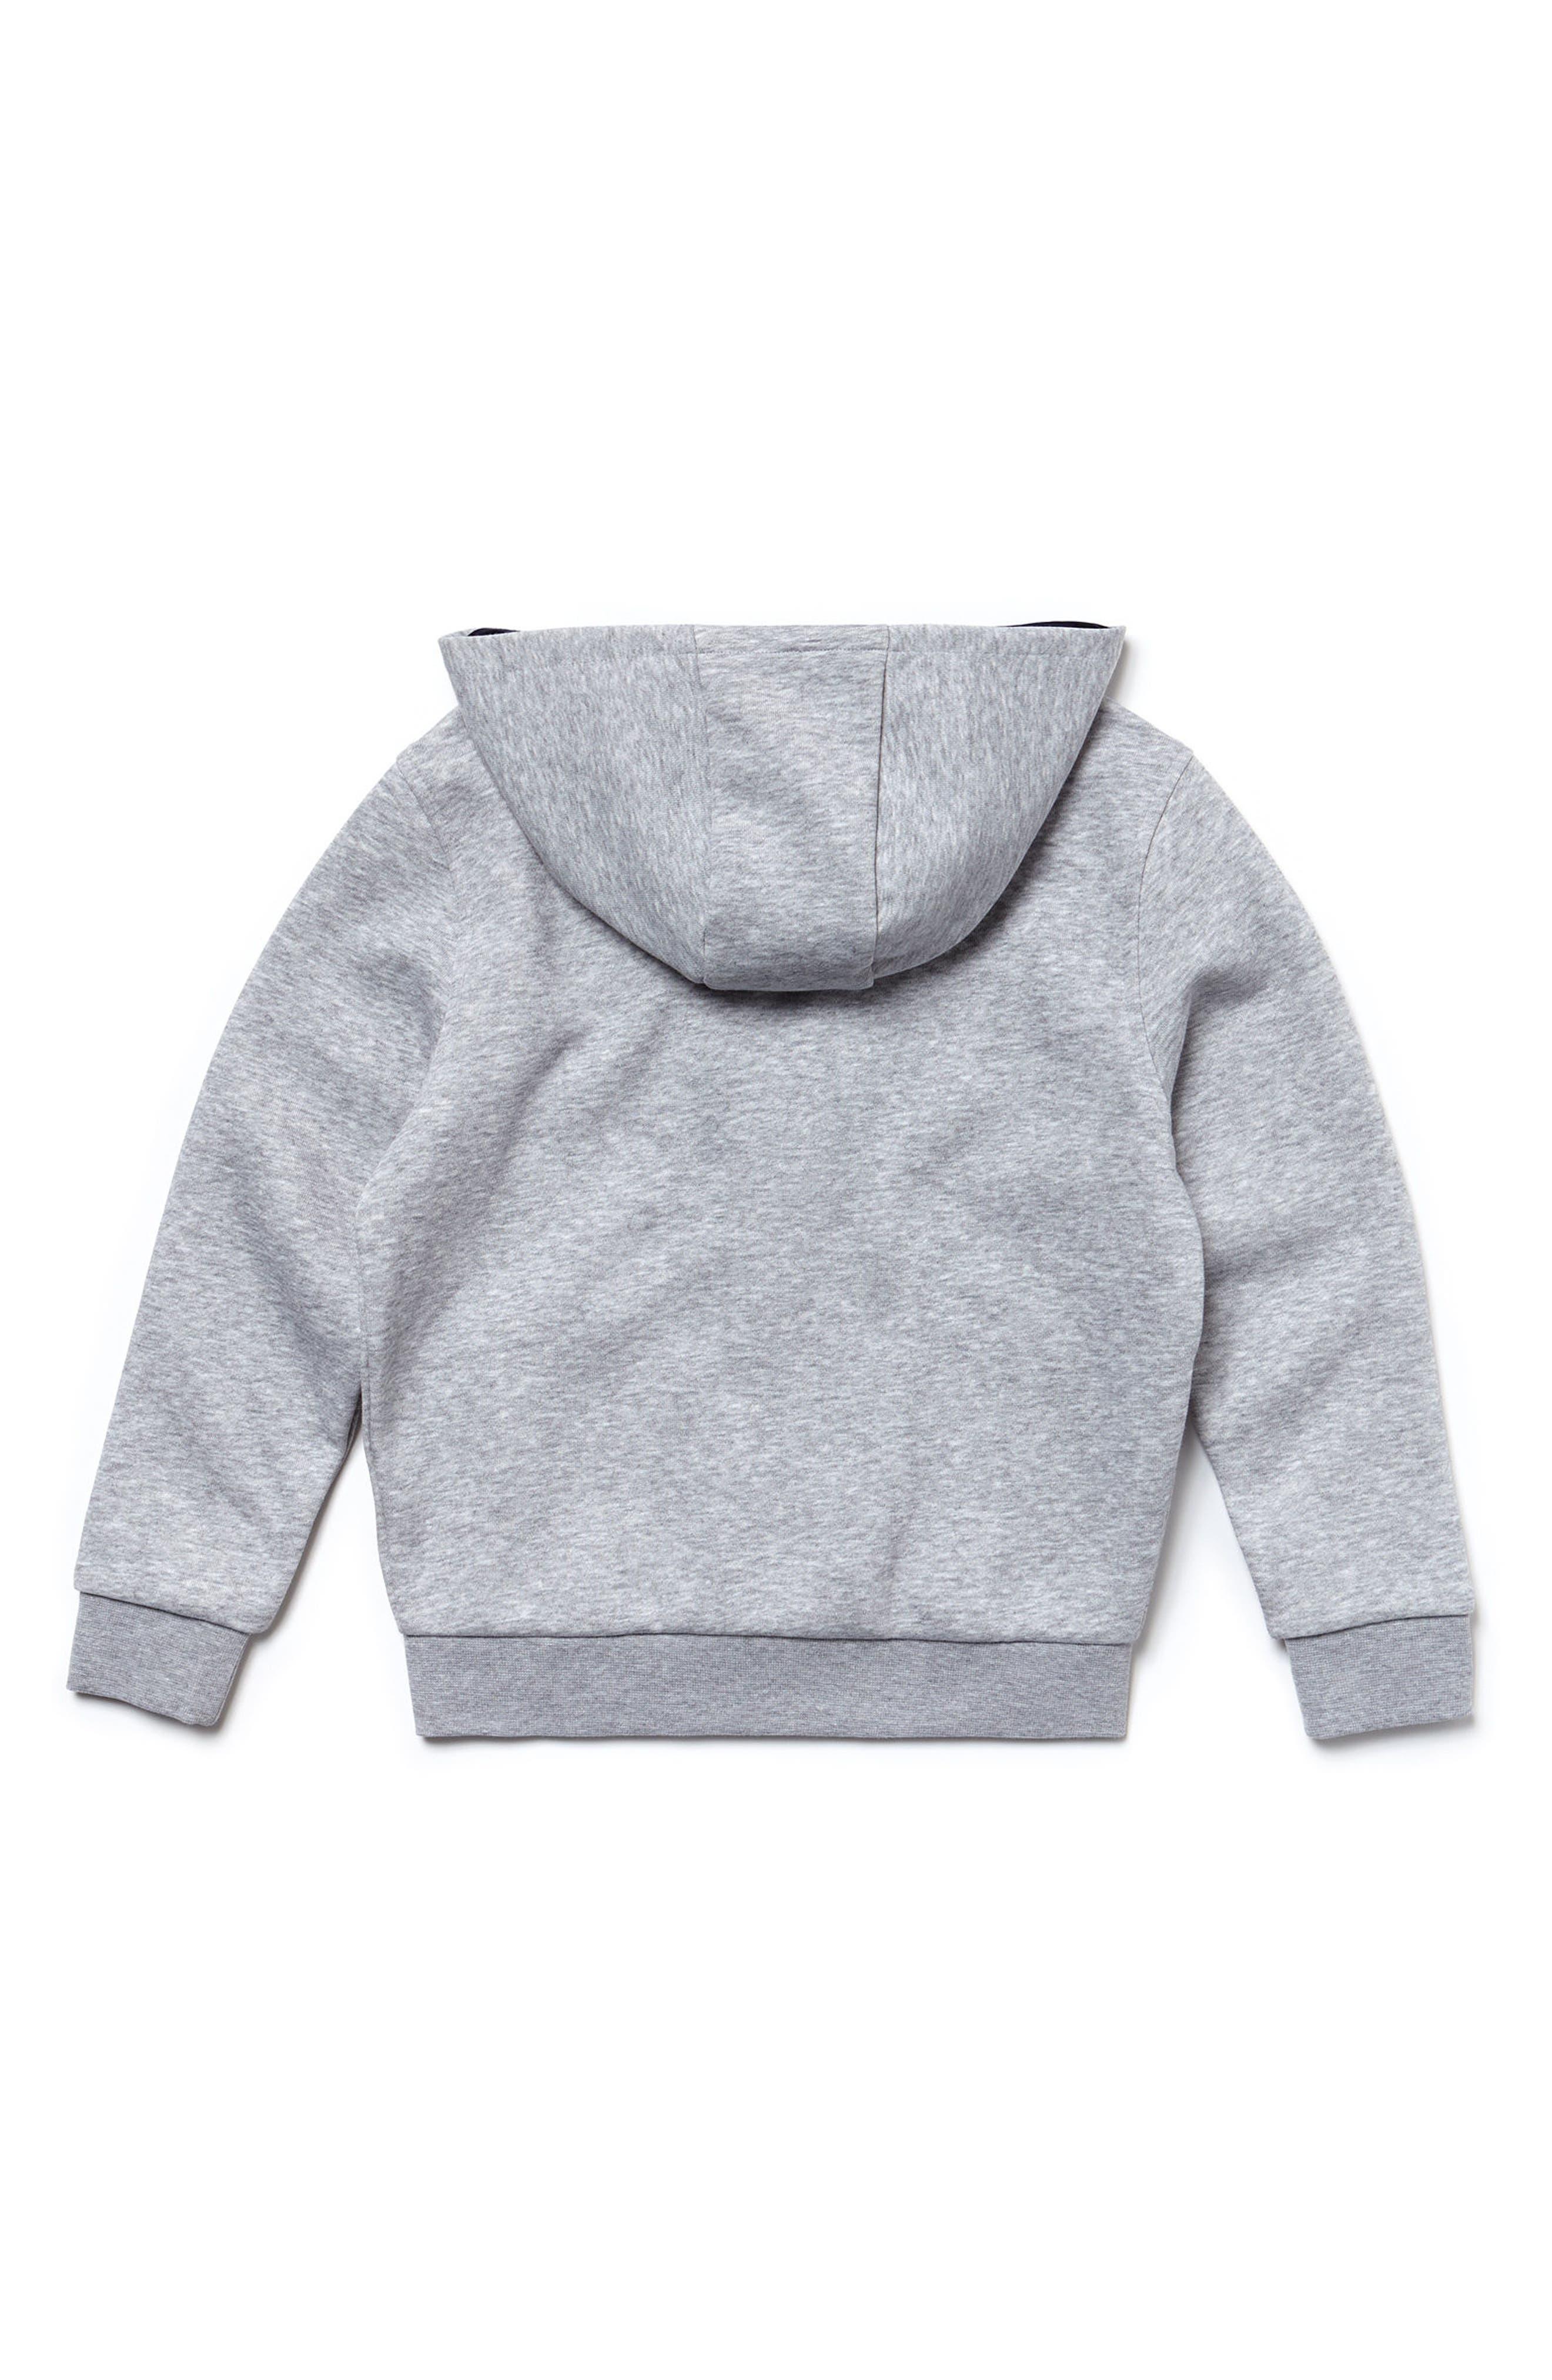 Sporty Fleece Full Zip Hoodie,                             Alternate thumbnail 2, color,                             Silver Grey Chine